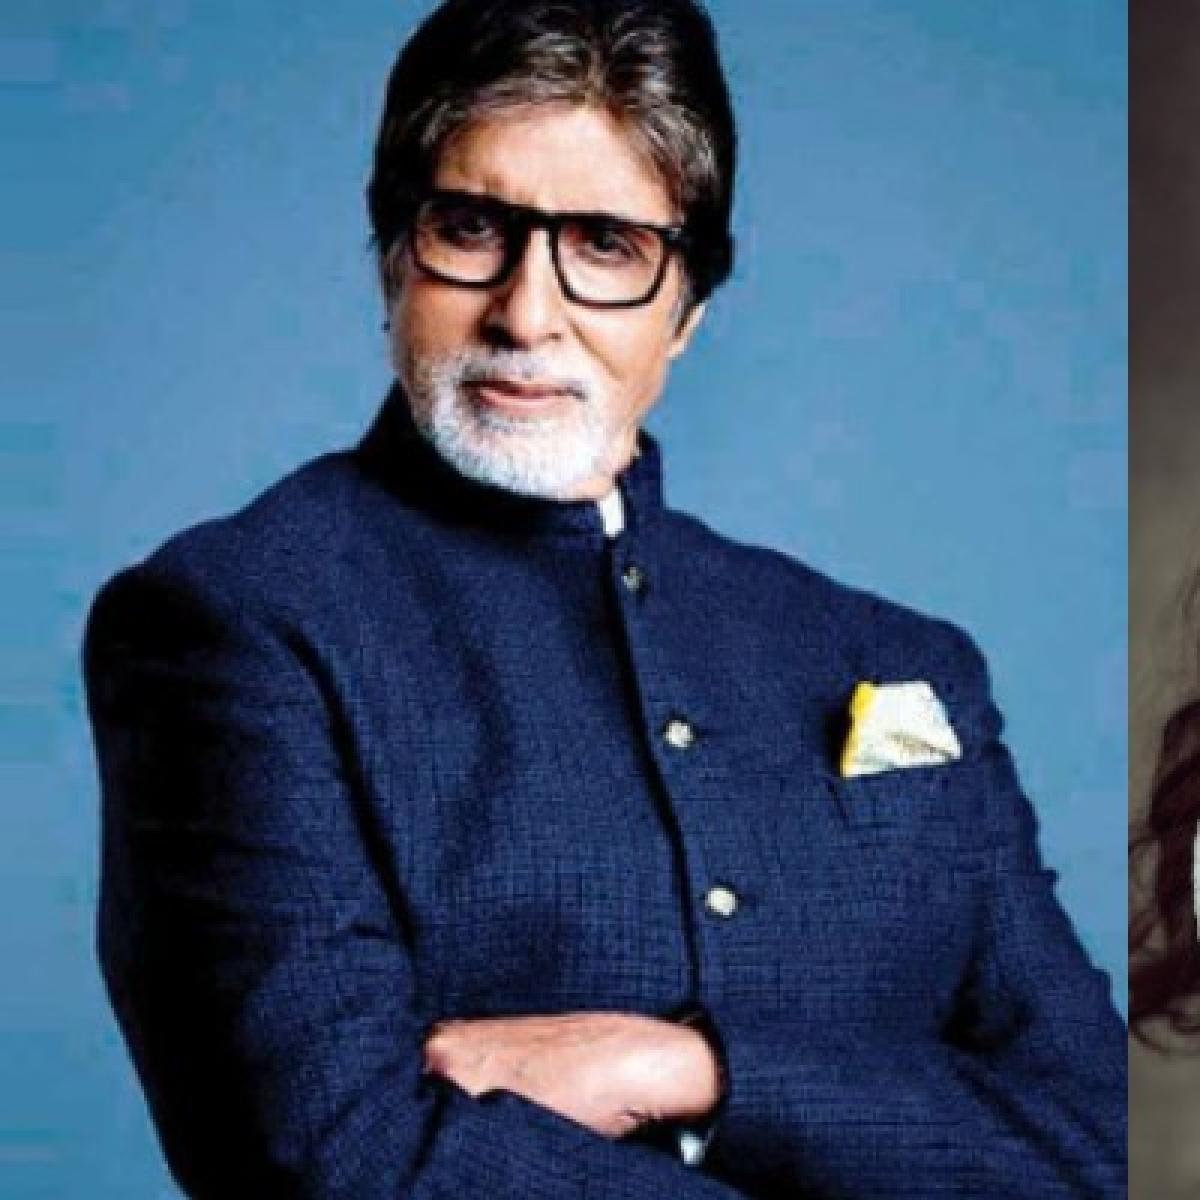 Amitabh Bachchan, Sonakshi Sinha top the most Tweeted handles list of 2019